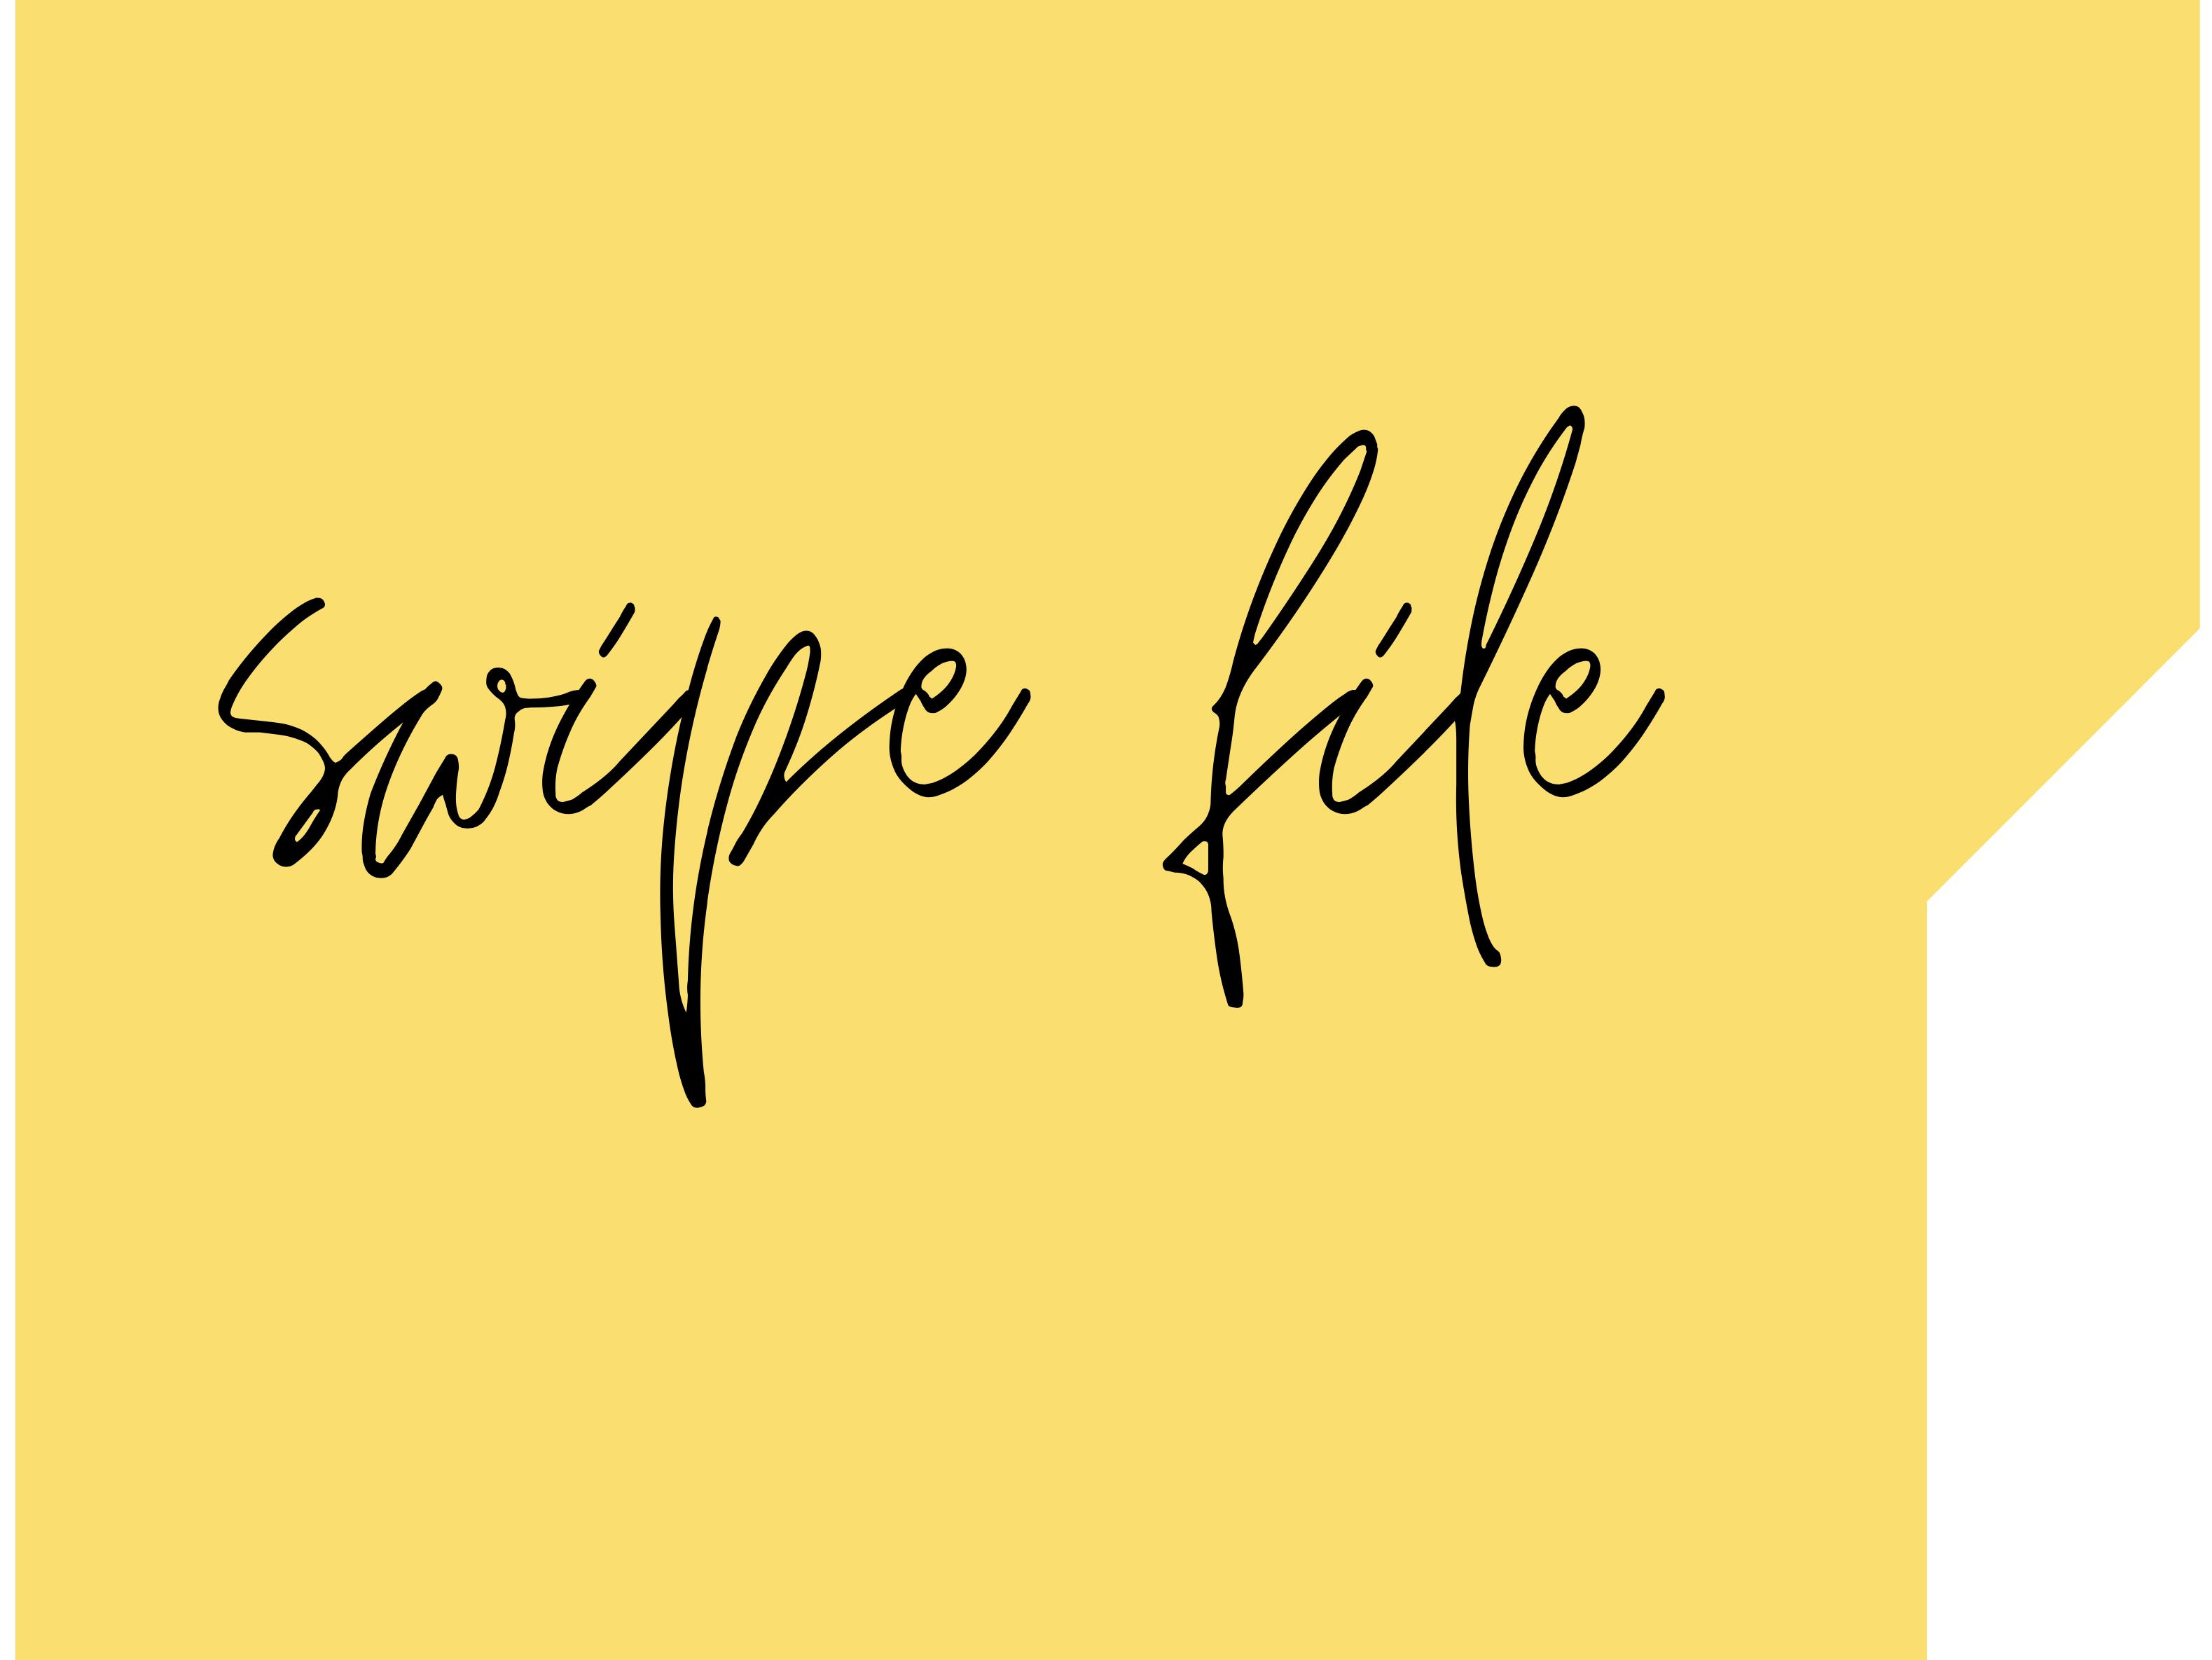 I will give you my Premium Copywriting Swipe file